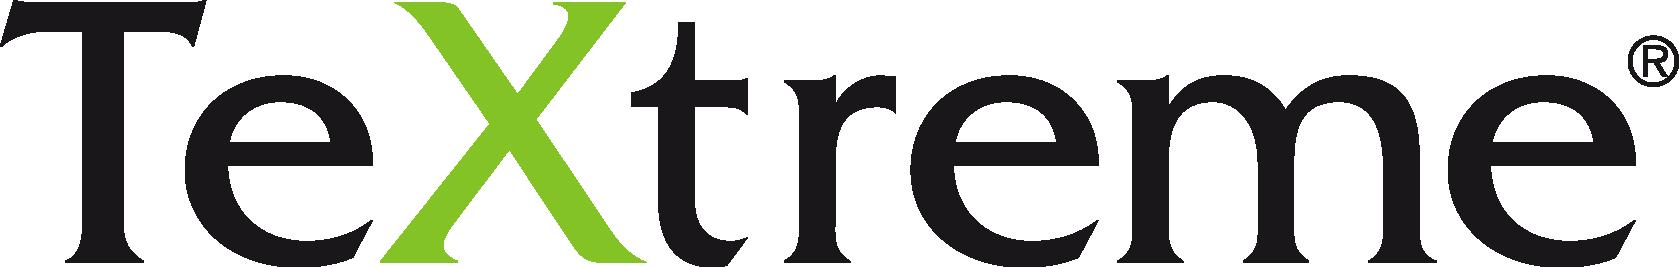 TeXtreme_RGB.png